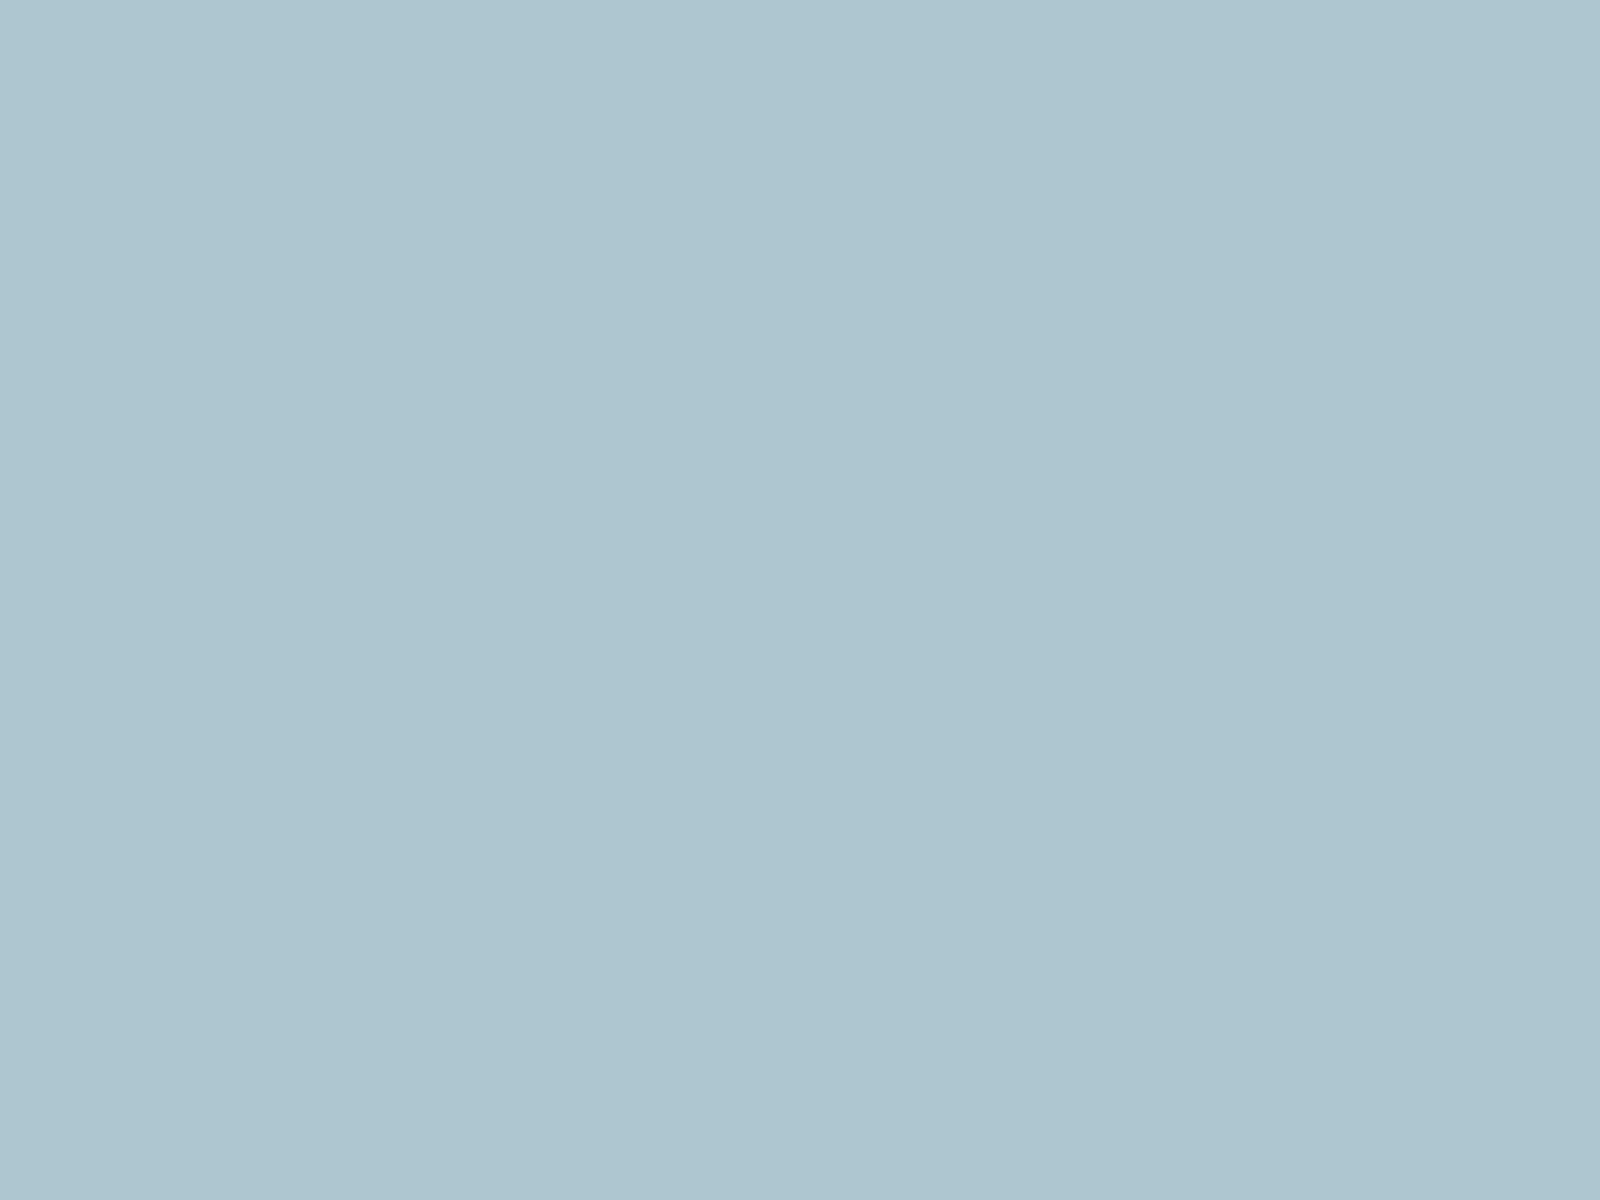 1600x1200 Pastel Blue Solid Color Background